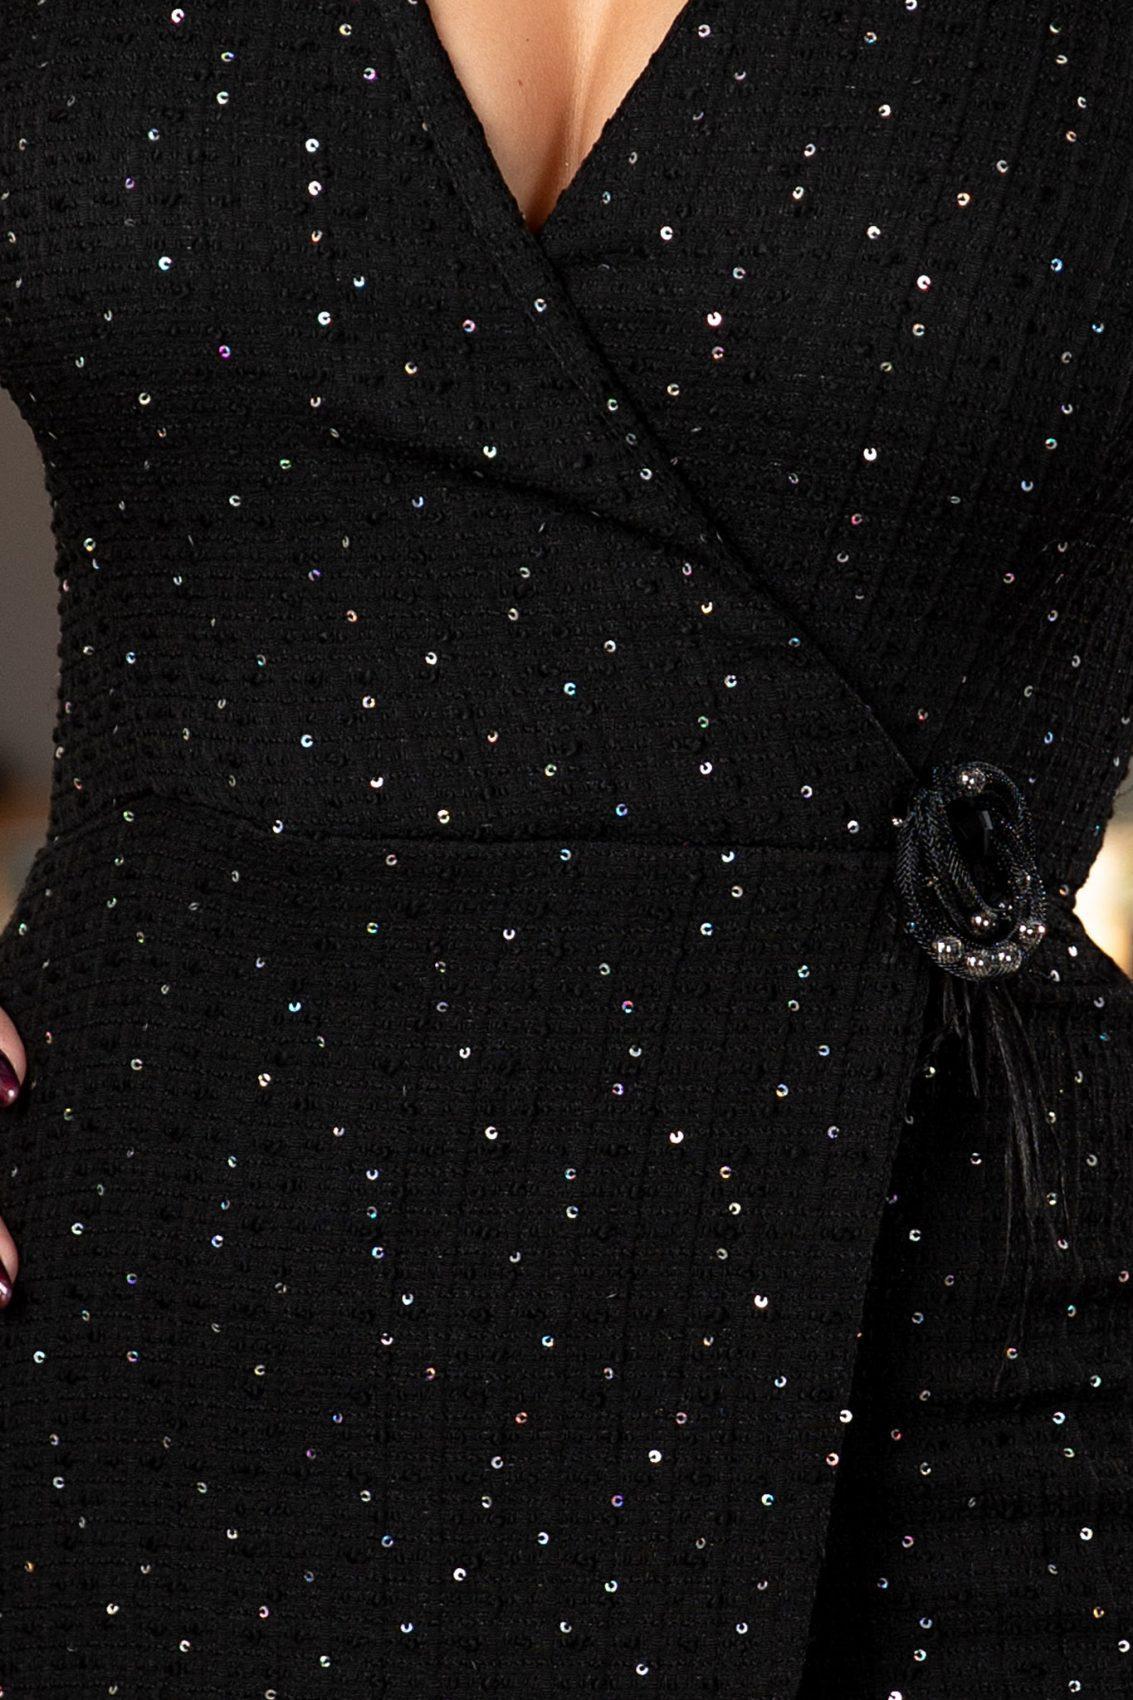 Angella Μαύρο Φόρεμα 6043